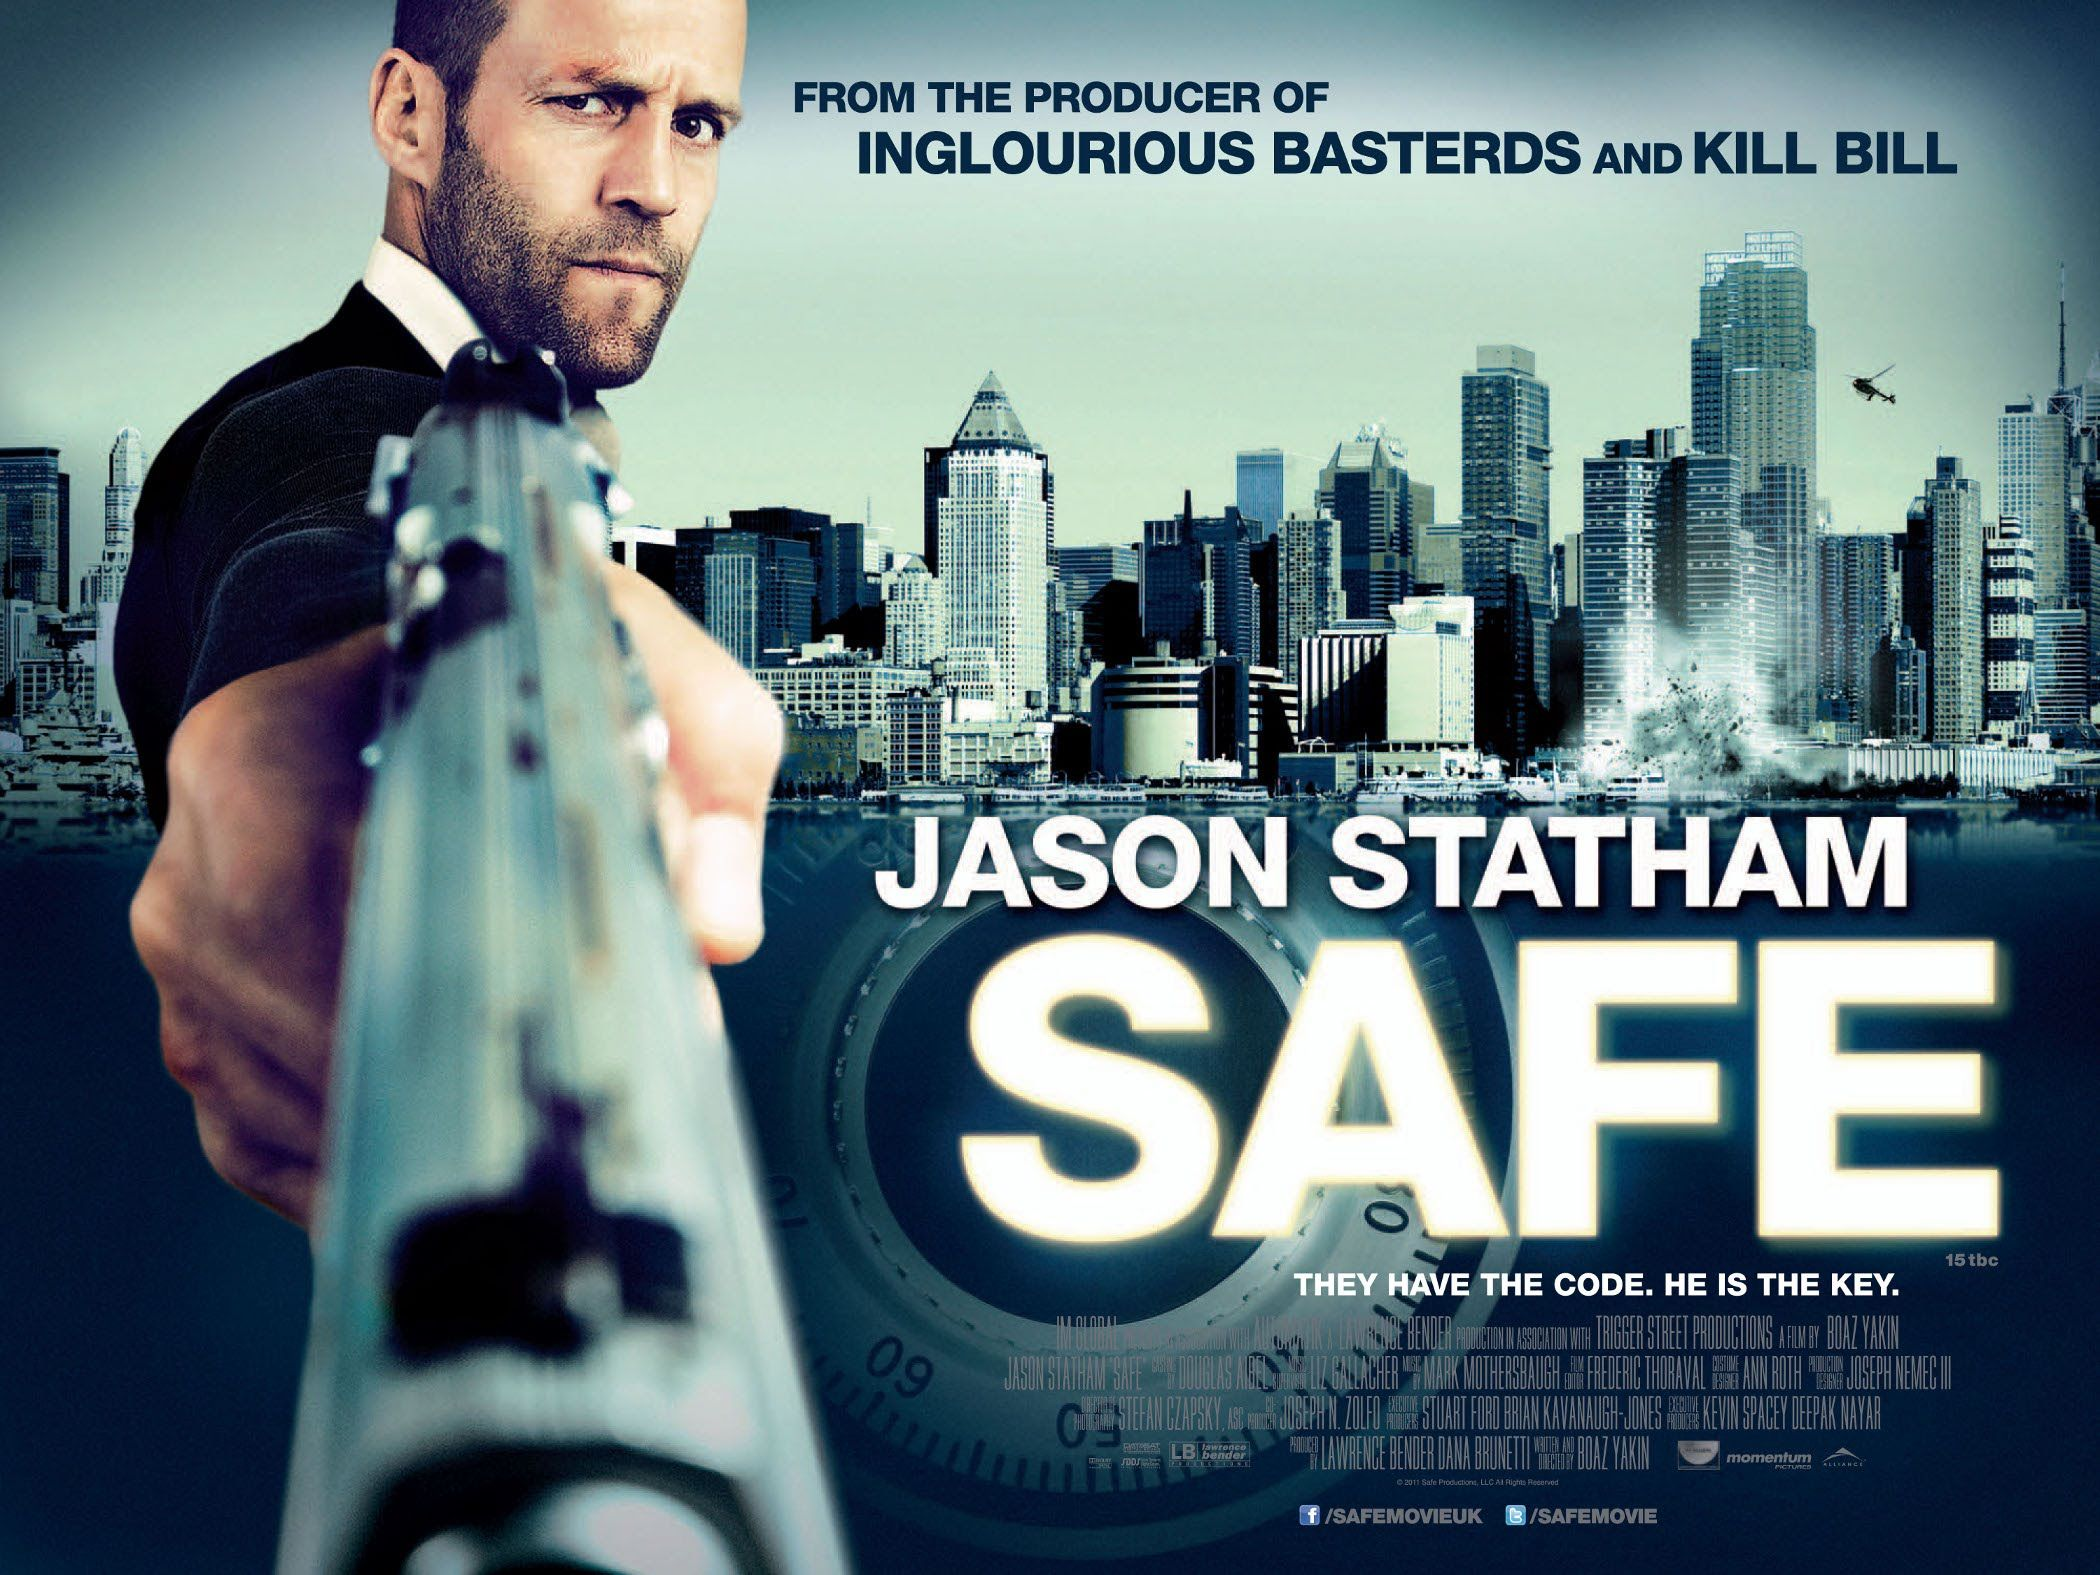 SAFE (815 AM) Jason statham, Statham, New poster